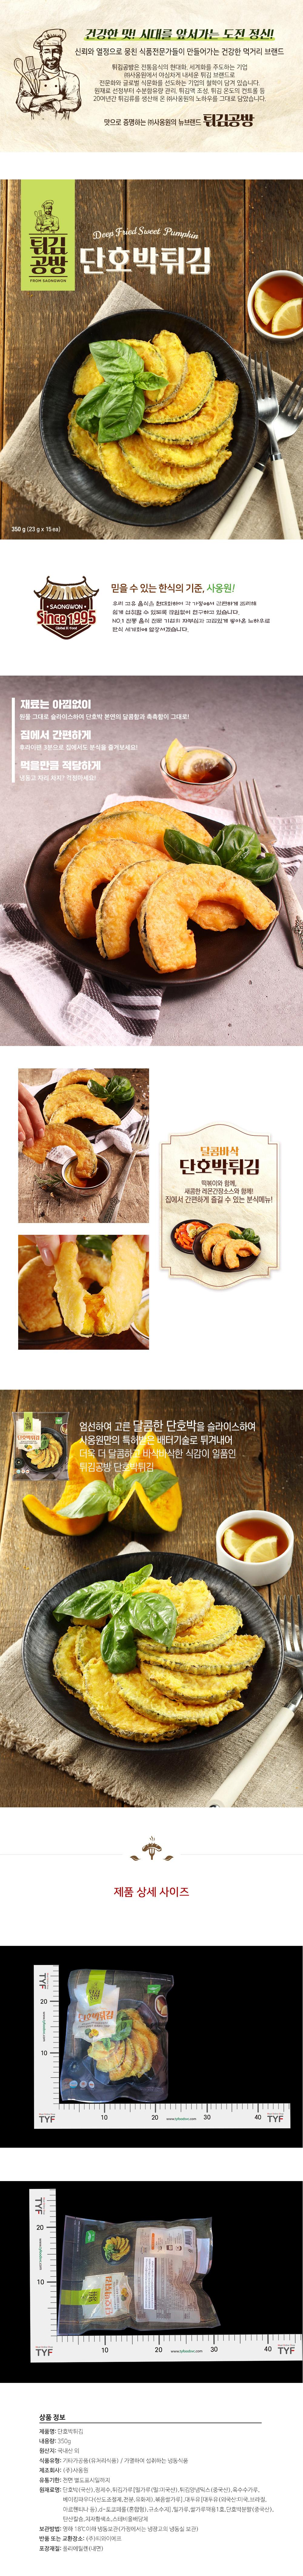 saongwon_friedpumpkin.jpg